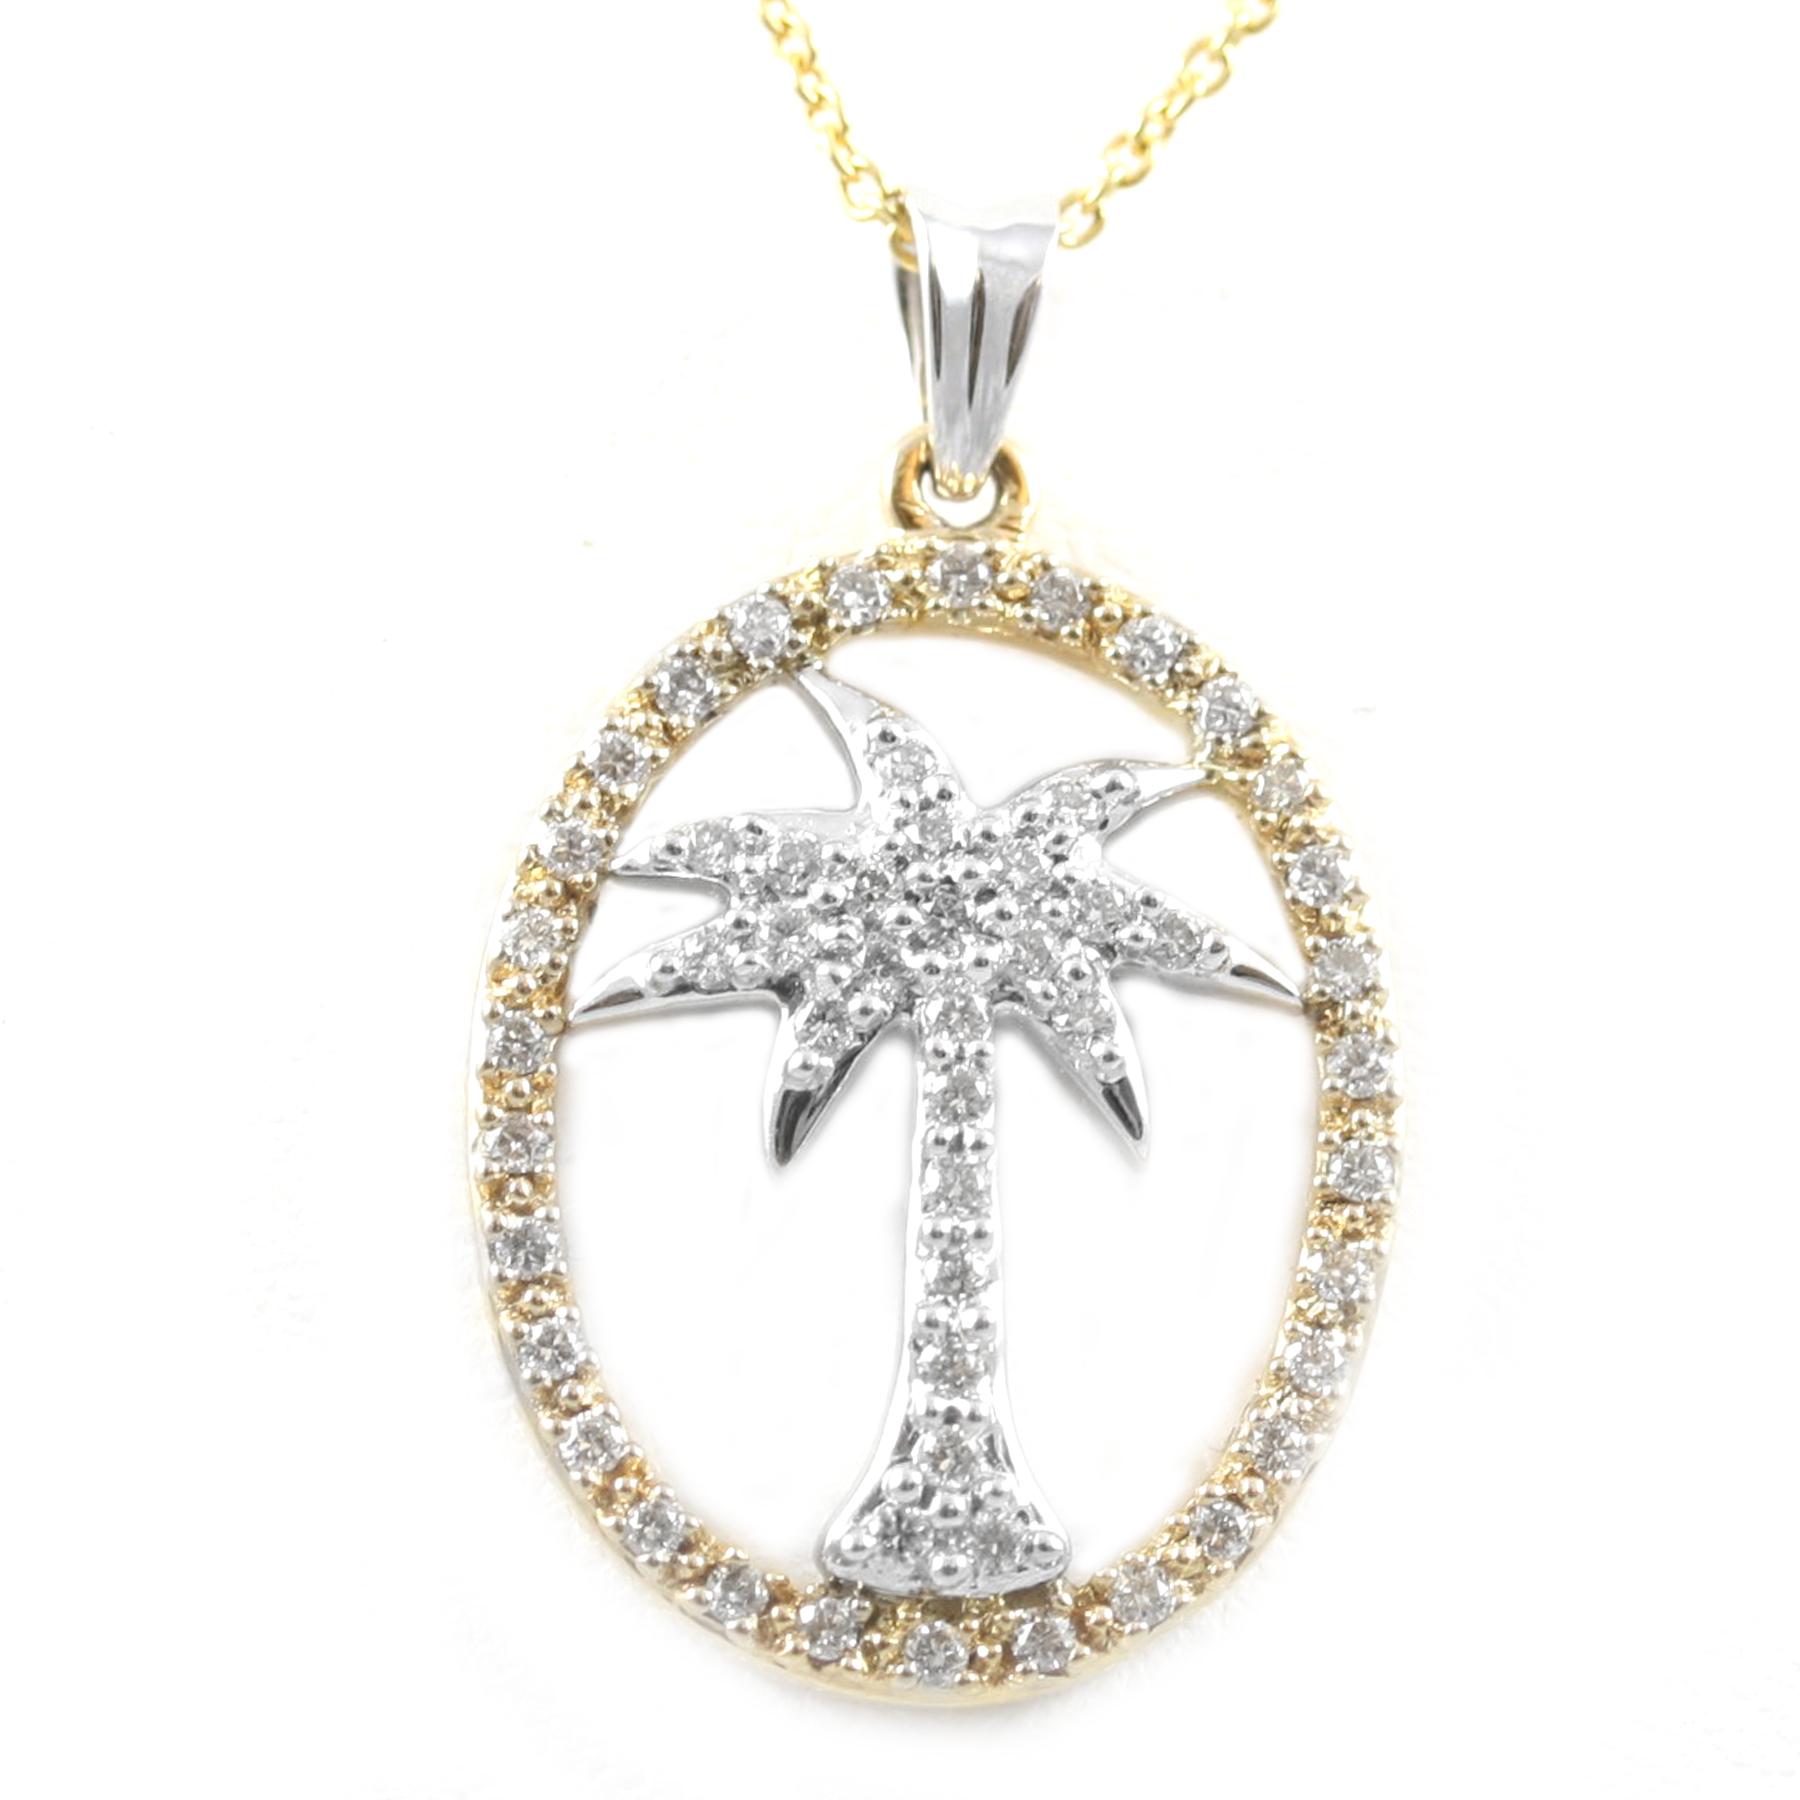 14 karat yellow gold white gold and diamond palm tree oval pendant 14 karat yellow gold white gold and diamond palm tree oval pendant mp2m05283 aloadofball Images